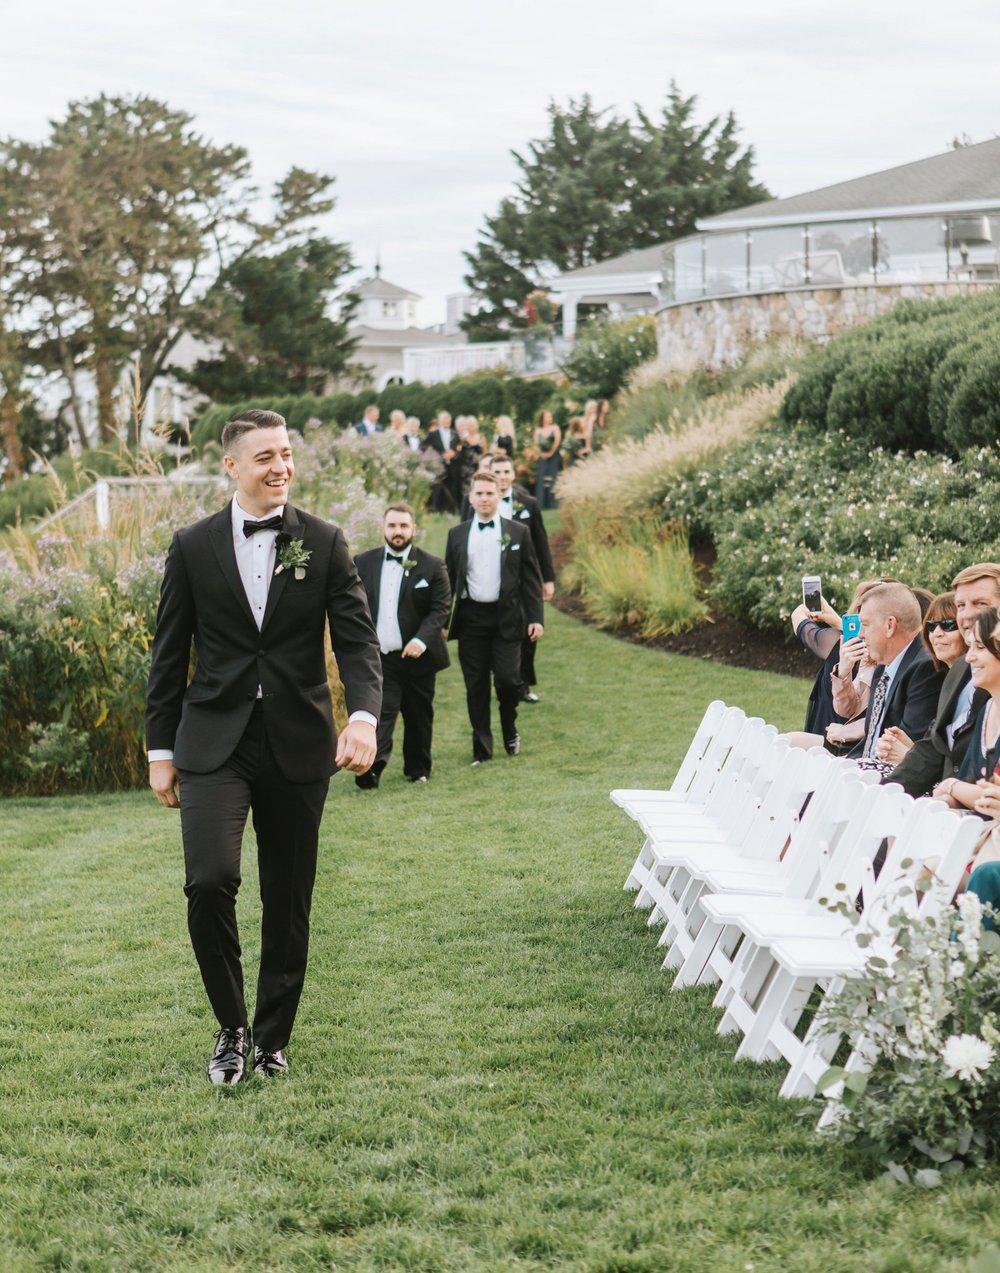 Wequassett-Wedding-Photographer-Cape-Cod-Boston-Lena-Mirisola-23.jpg